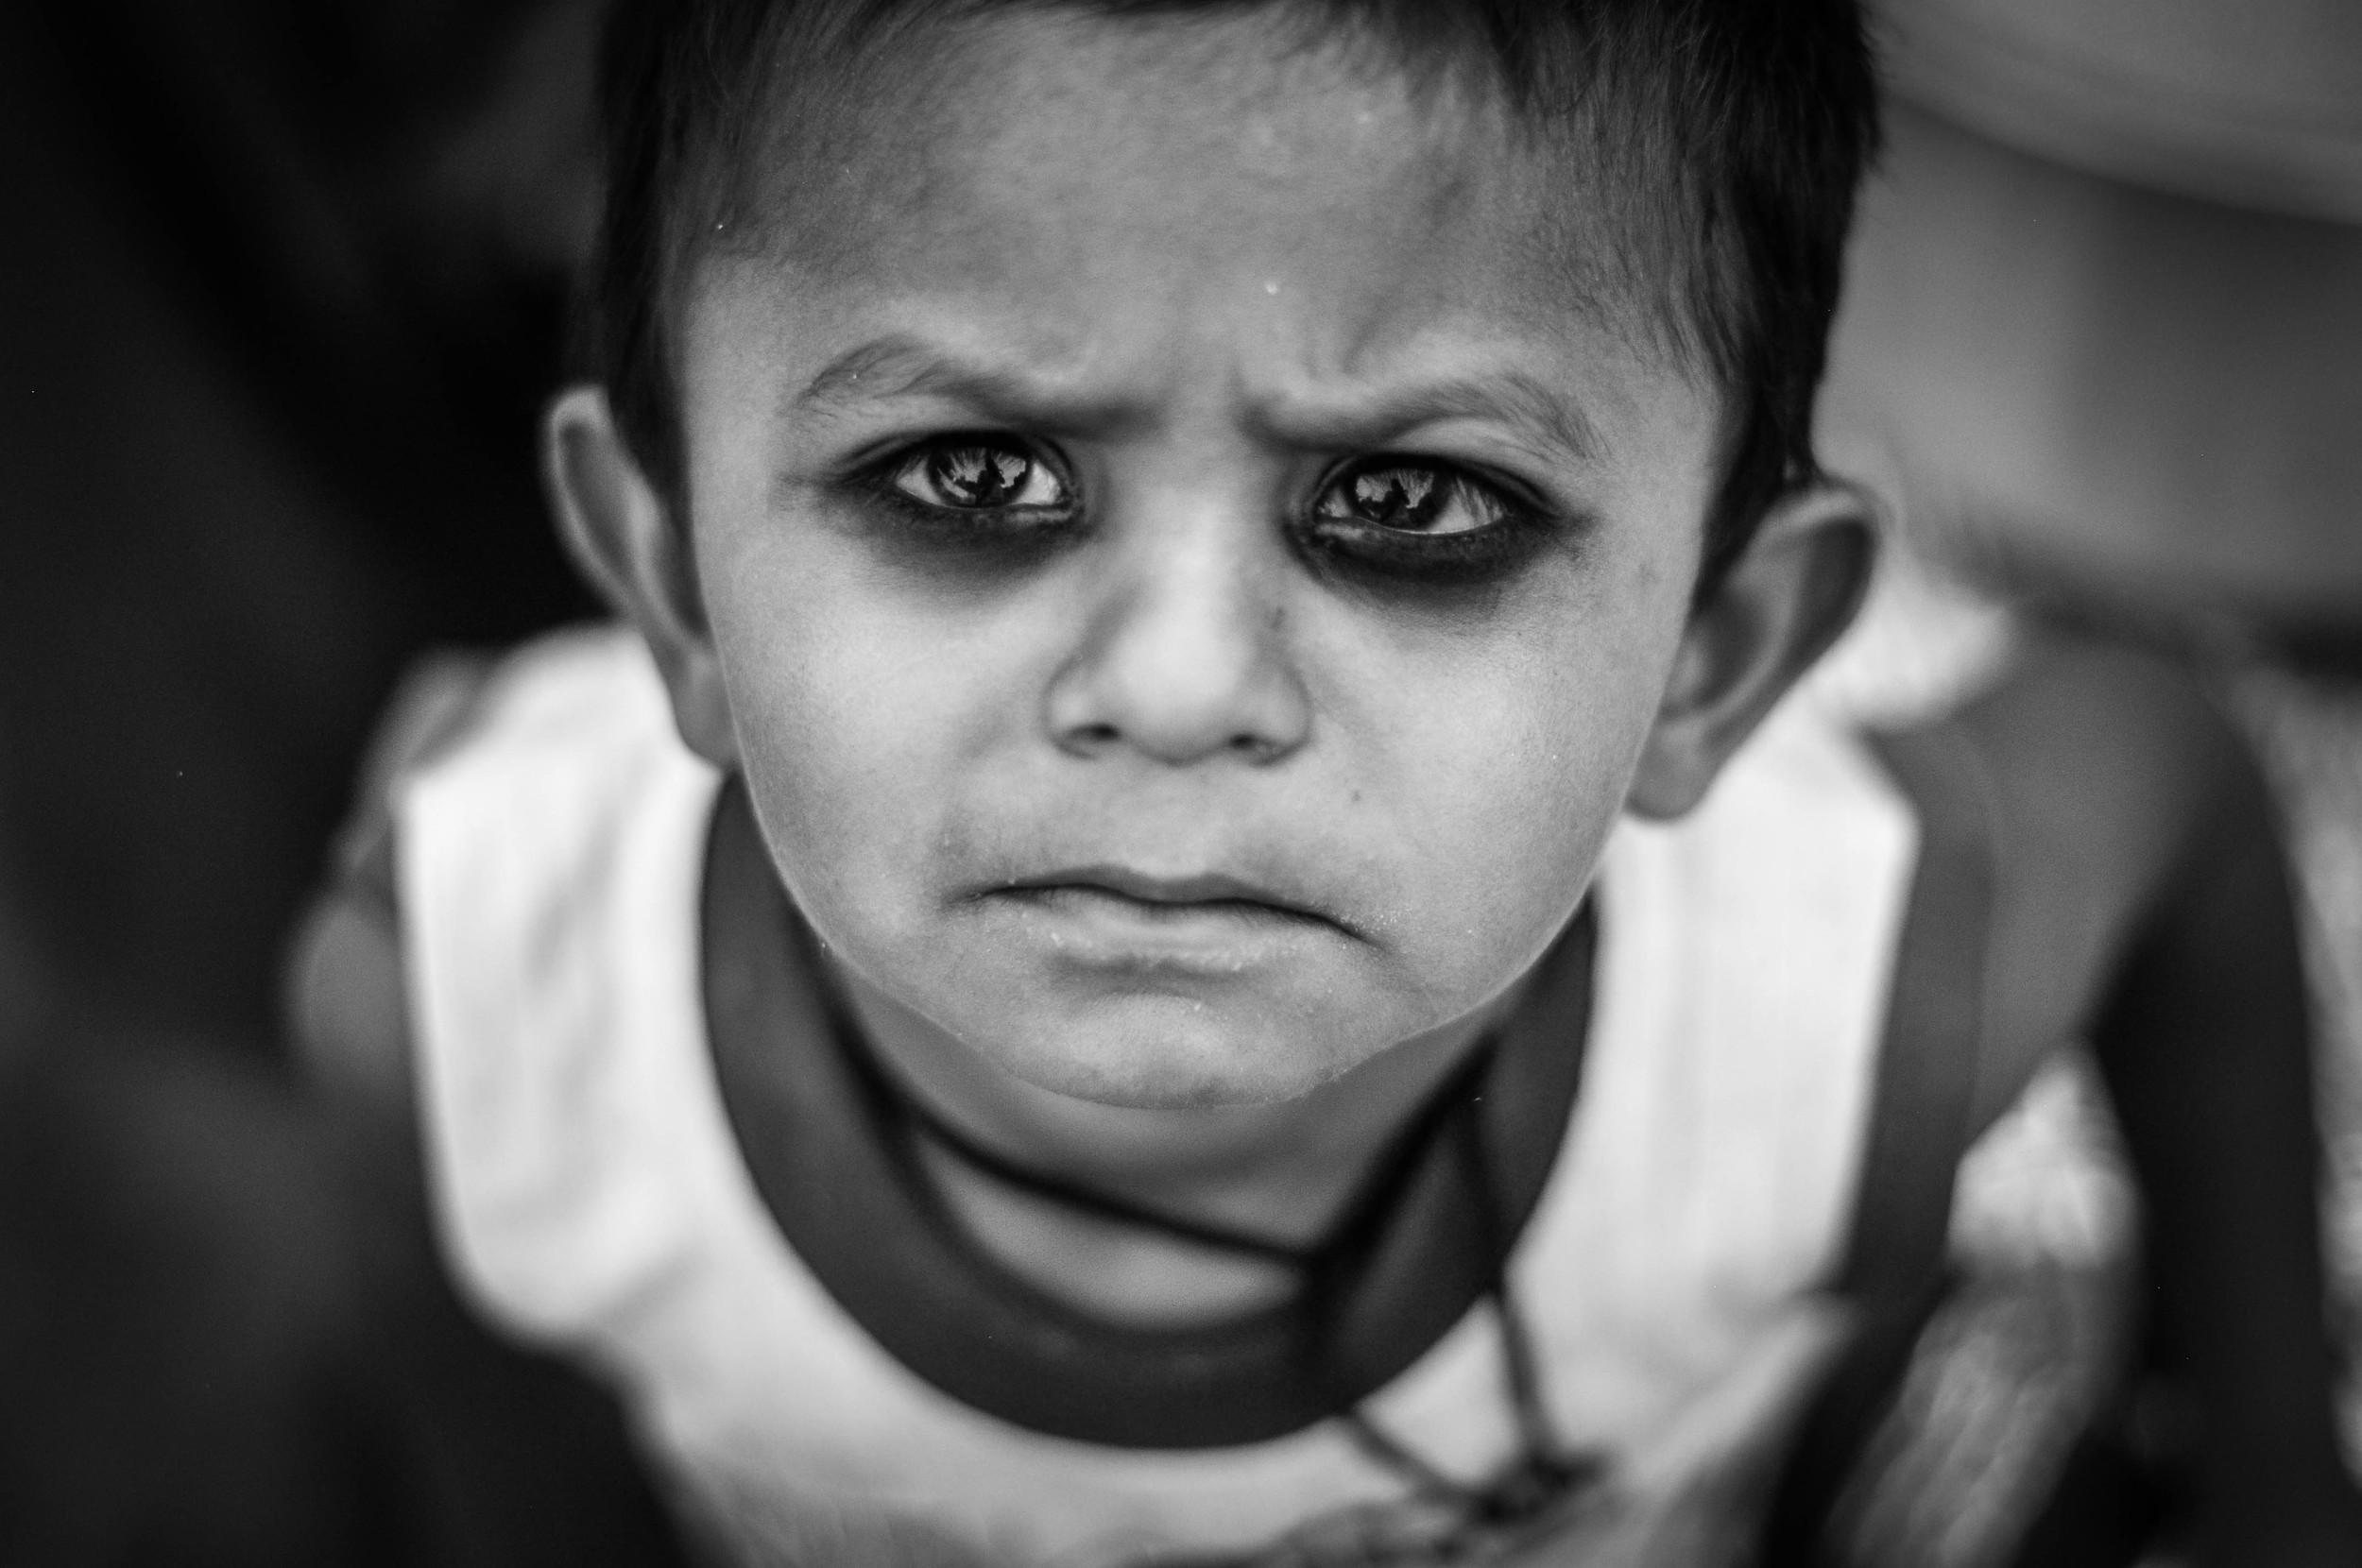 Hindu parents pain their children's eyes black because they believe it will keep away bad spirits. Jasola Slum, India.